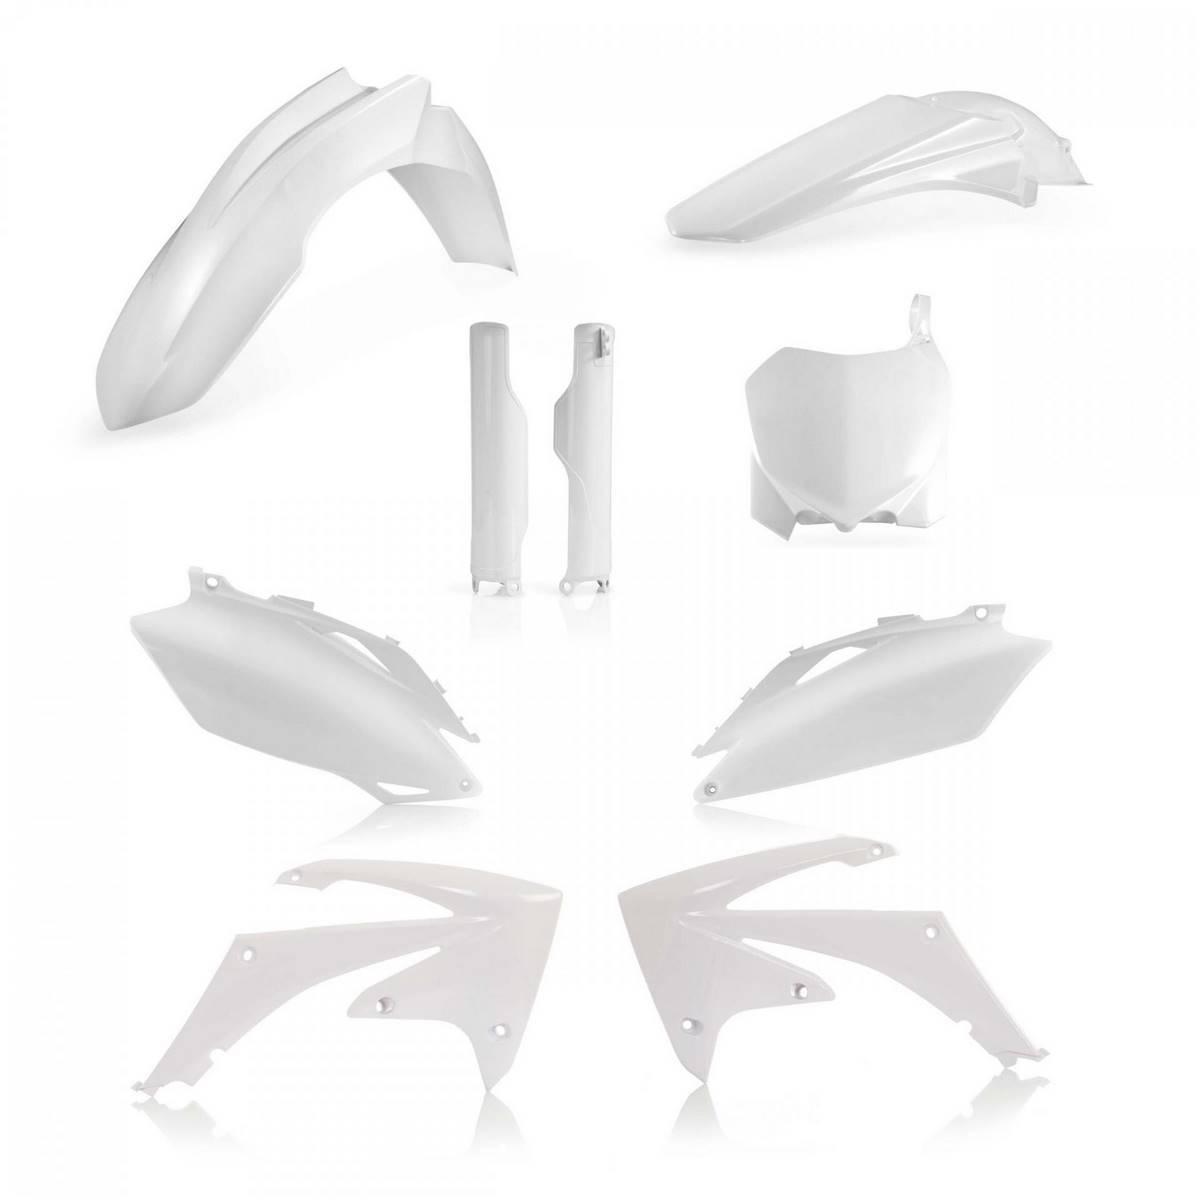 0013979-030 - Full Kit Plasticos Acerbis Crf250 10 Crf 450 09 10 Blanco